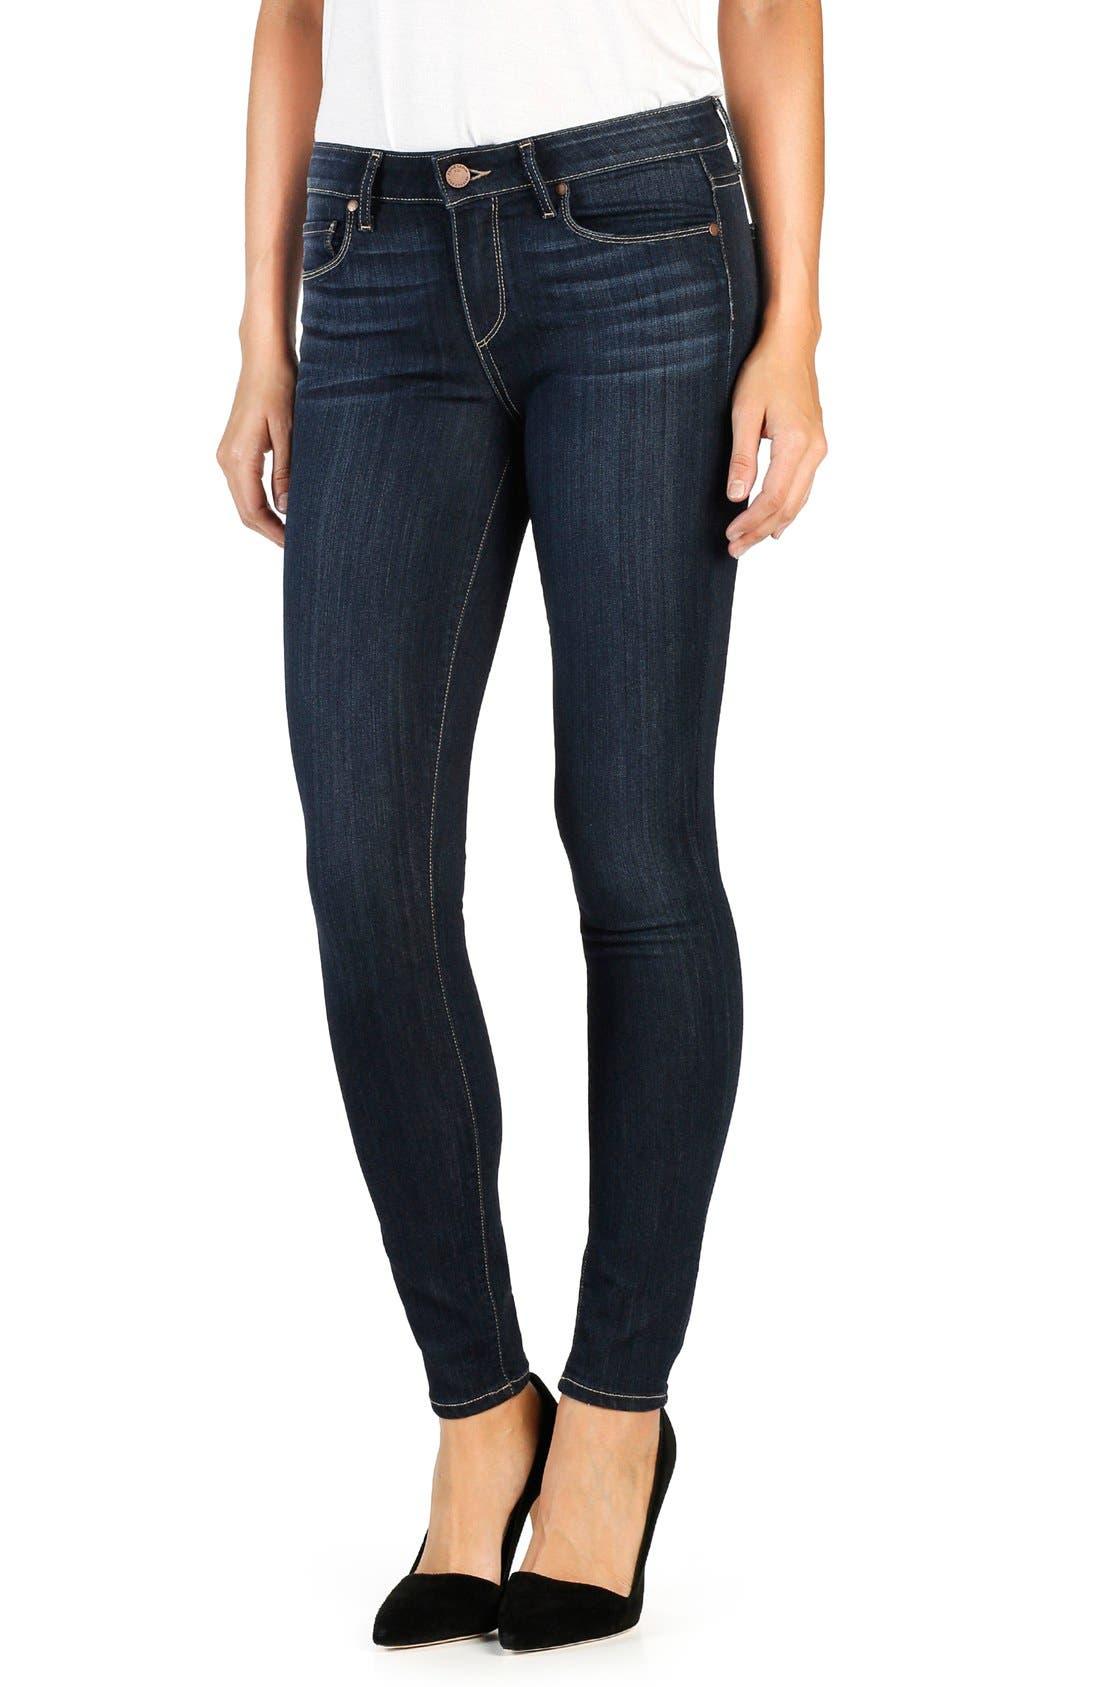 Alternate Image 1 Selected - PAIGE Transcend Verdugo Ultra Skinny Jeans (Seneca)